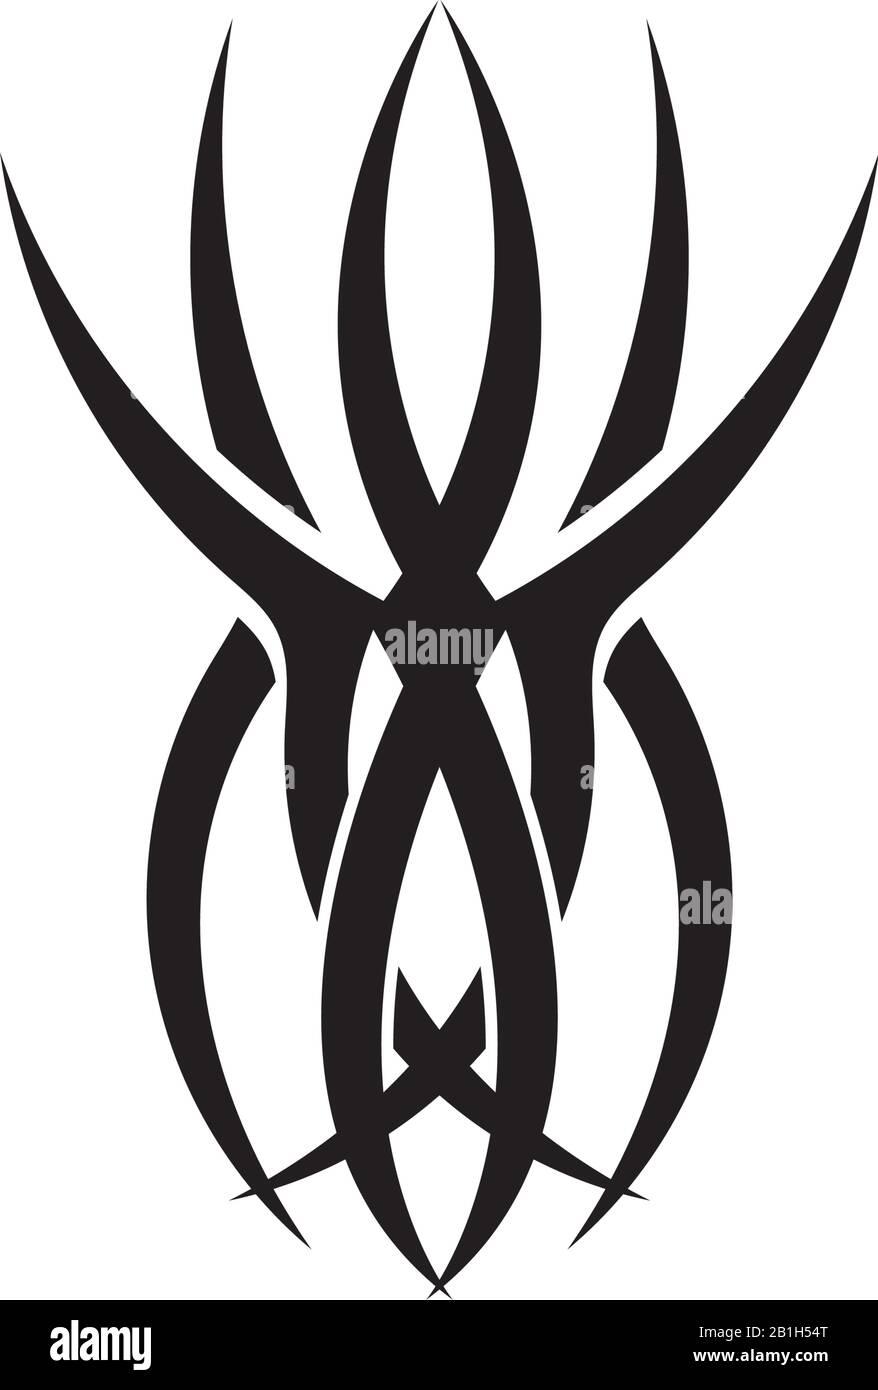 Tribal Tattoos Art Tribal Tattoo Vector Sketch Of A Tattoo Idea For Design Stock Vector Image Art Alamy Download 8,389 tattoo free vectors. https www alamy com tribal tattoos art tribal tattoo vector sketch of a tattoo idea for design image345199256 html